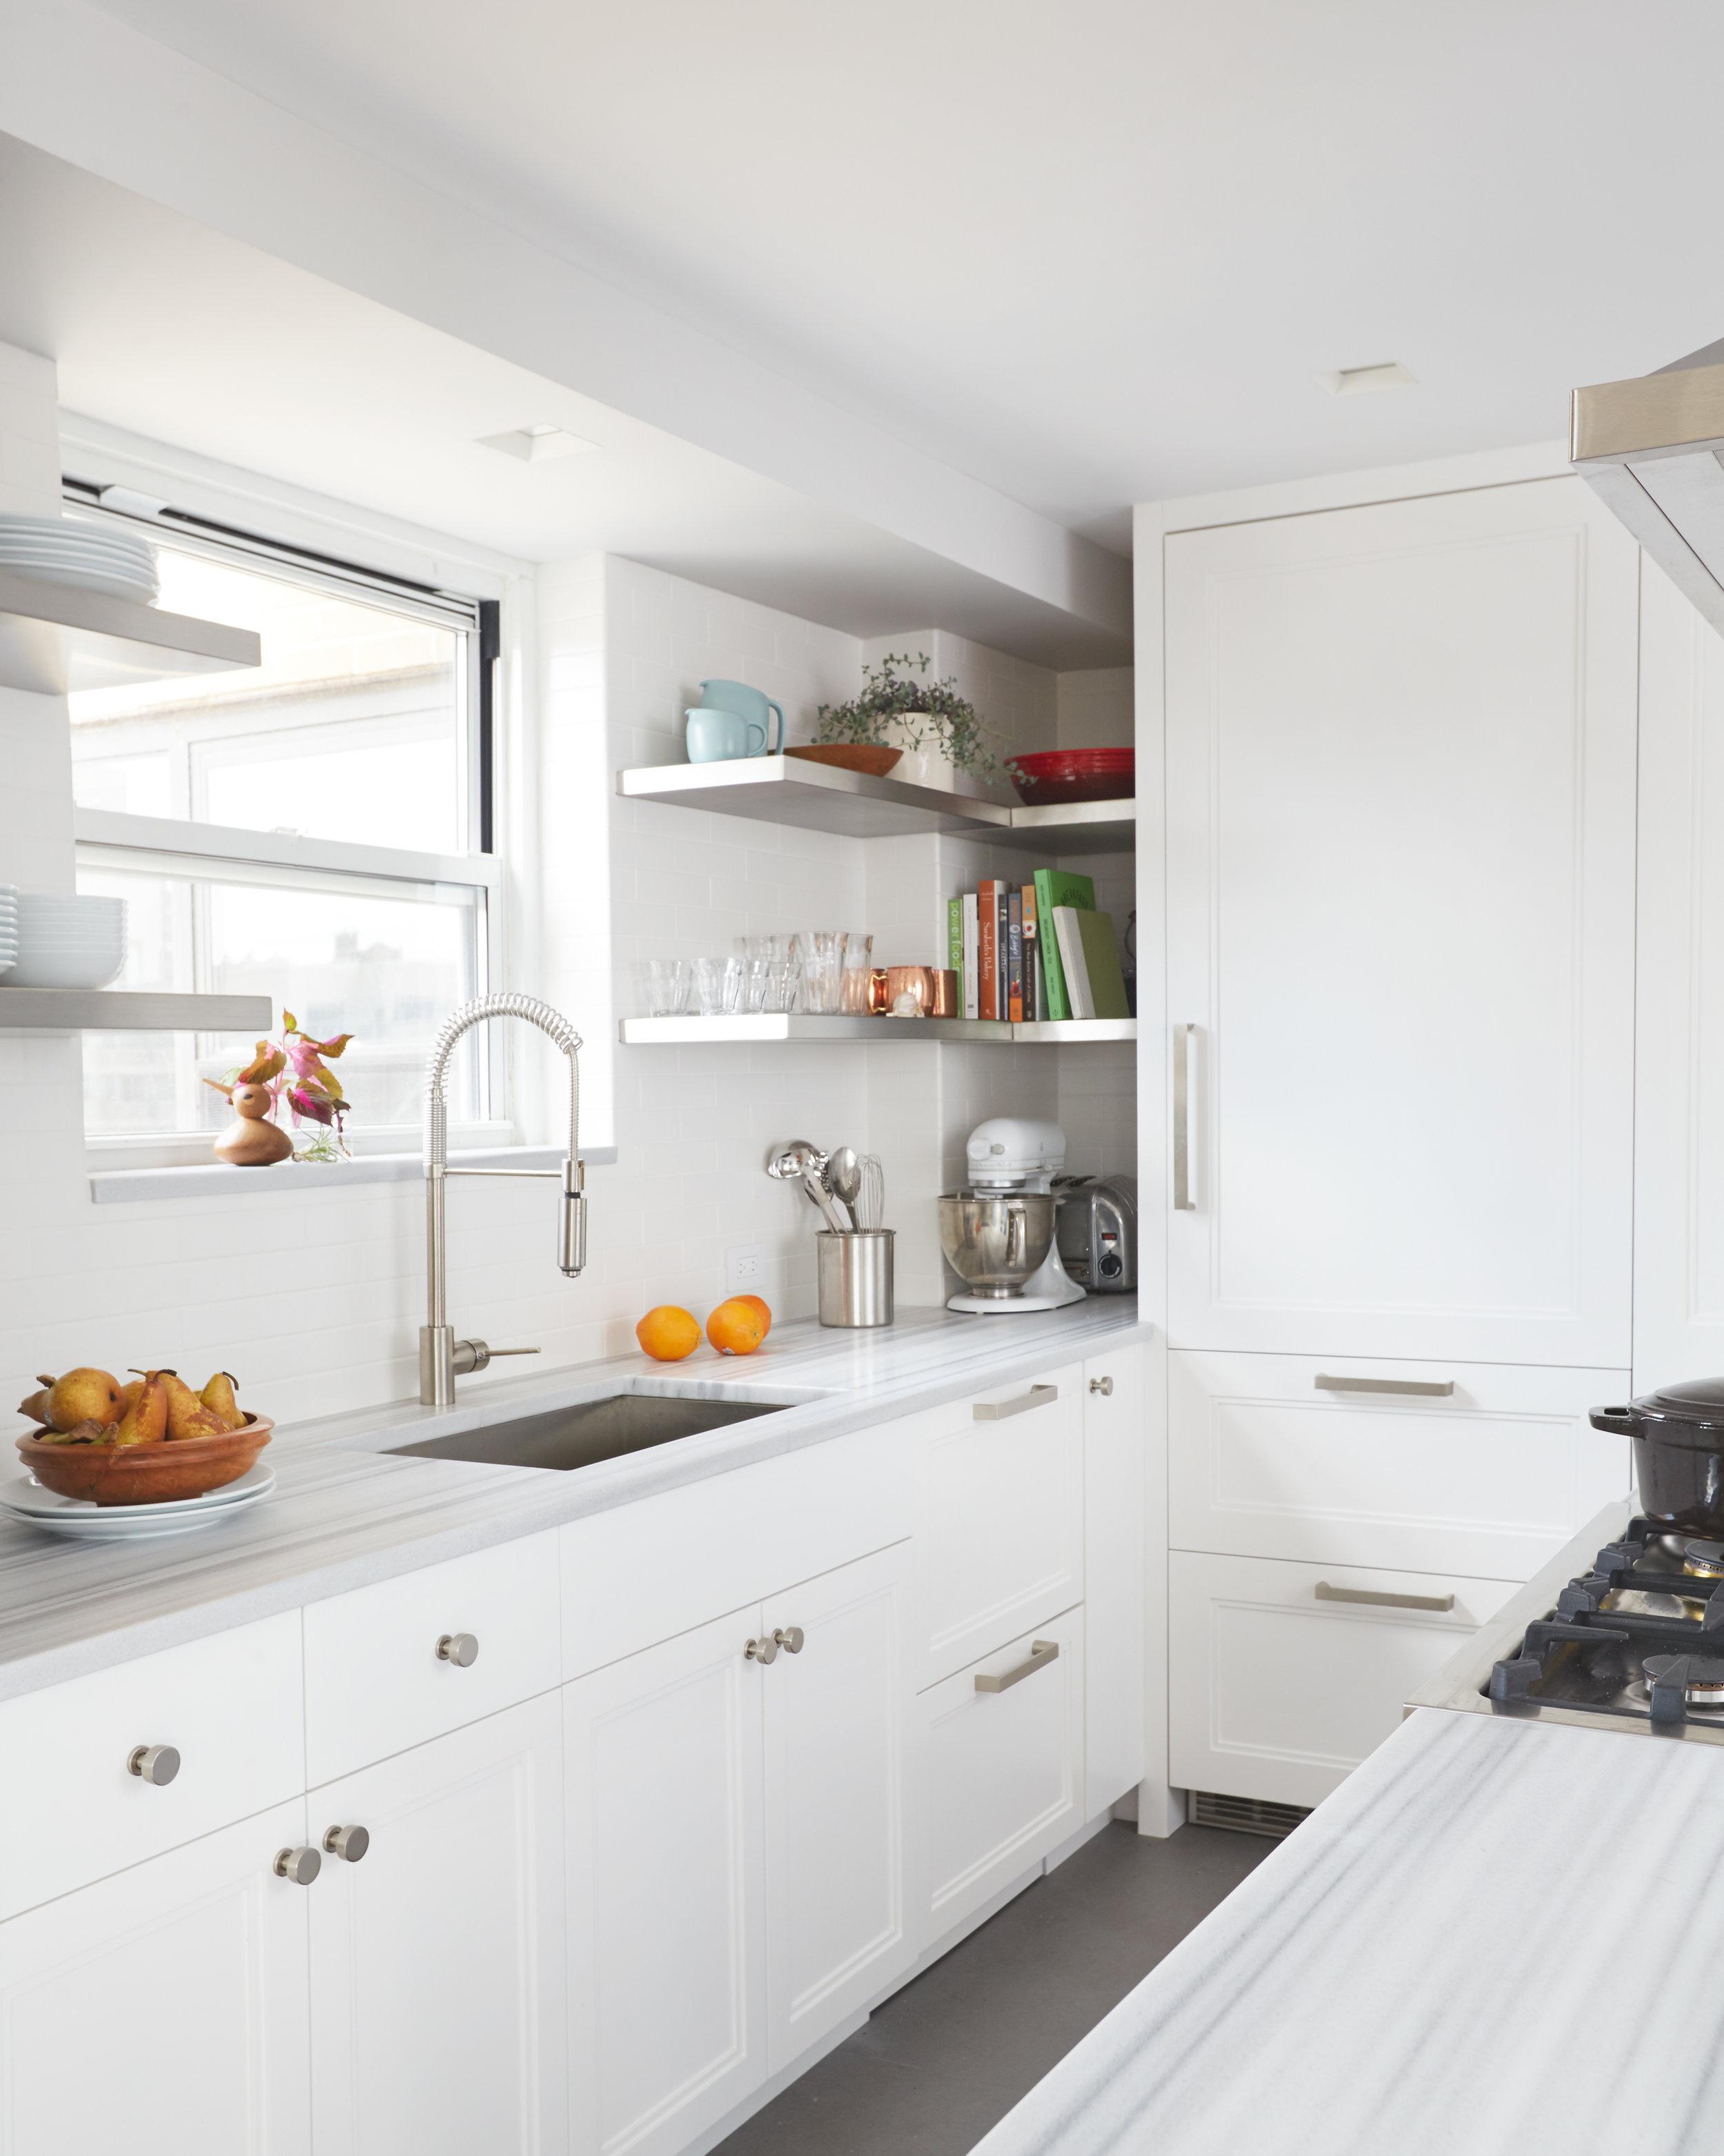 101-duplex-penthouse-kitchen-renovation